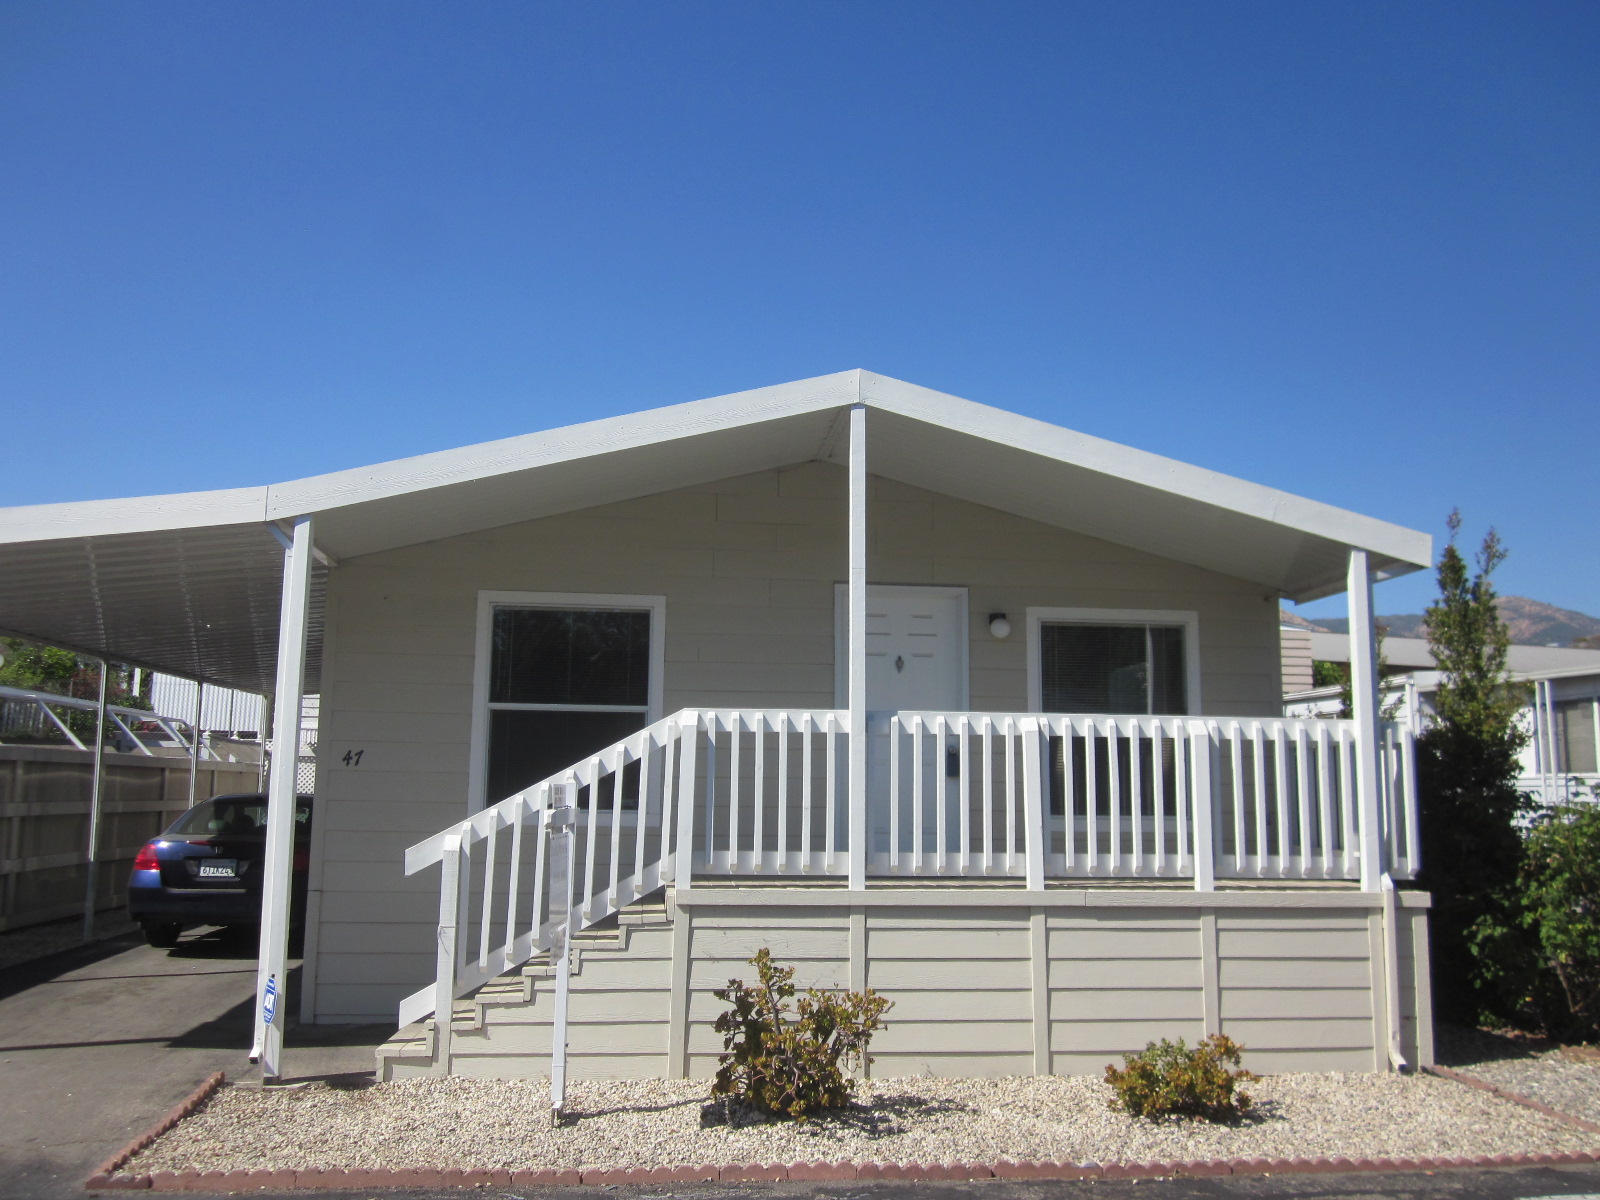 Property photo for 4025 State St #47 Santa Barbara, California 93110 - 14-1517